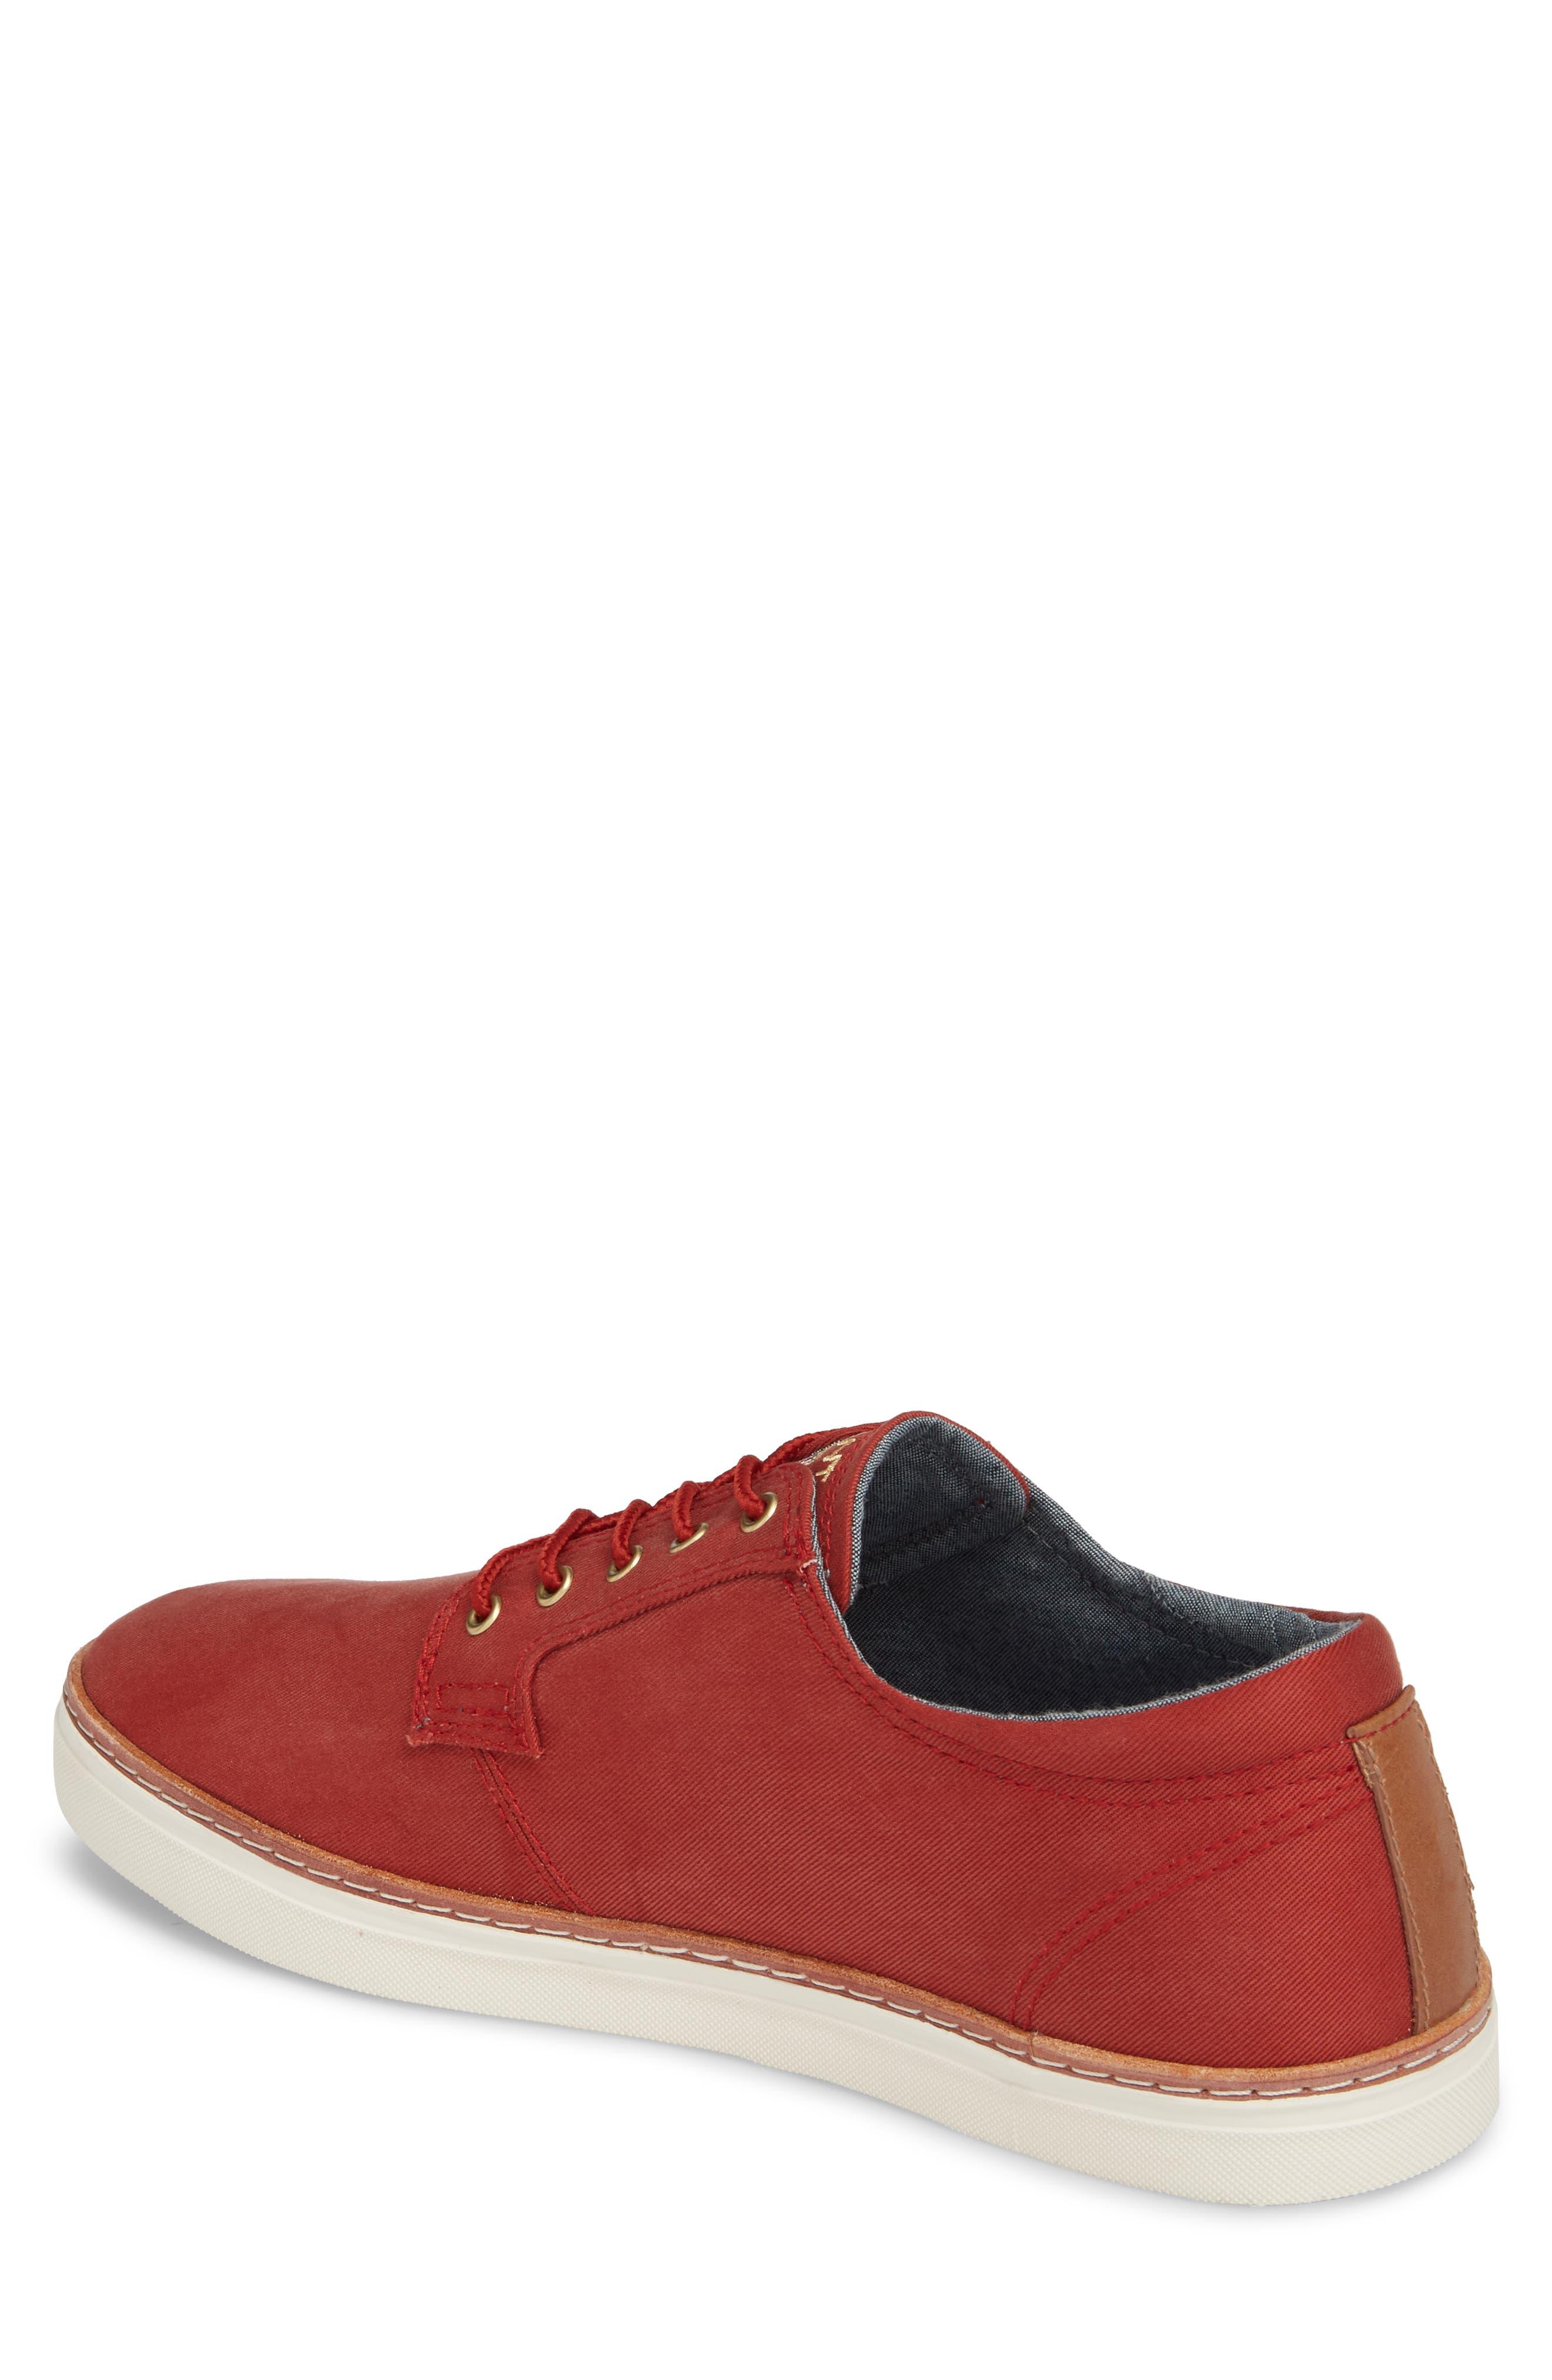 Bari Sneaker,                             Alternate thumbnail 2, color,                             RED TWILL